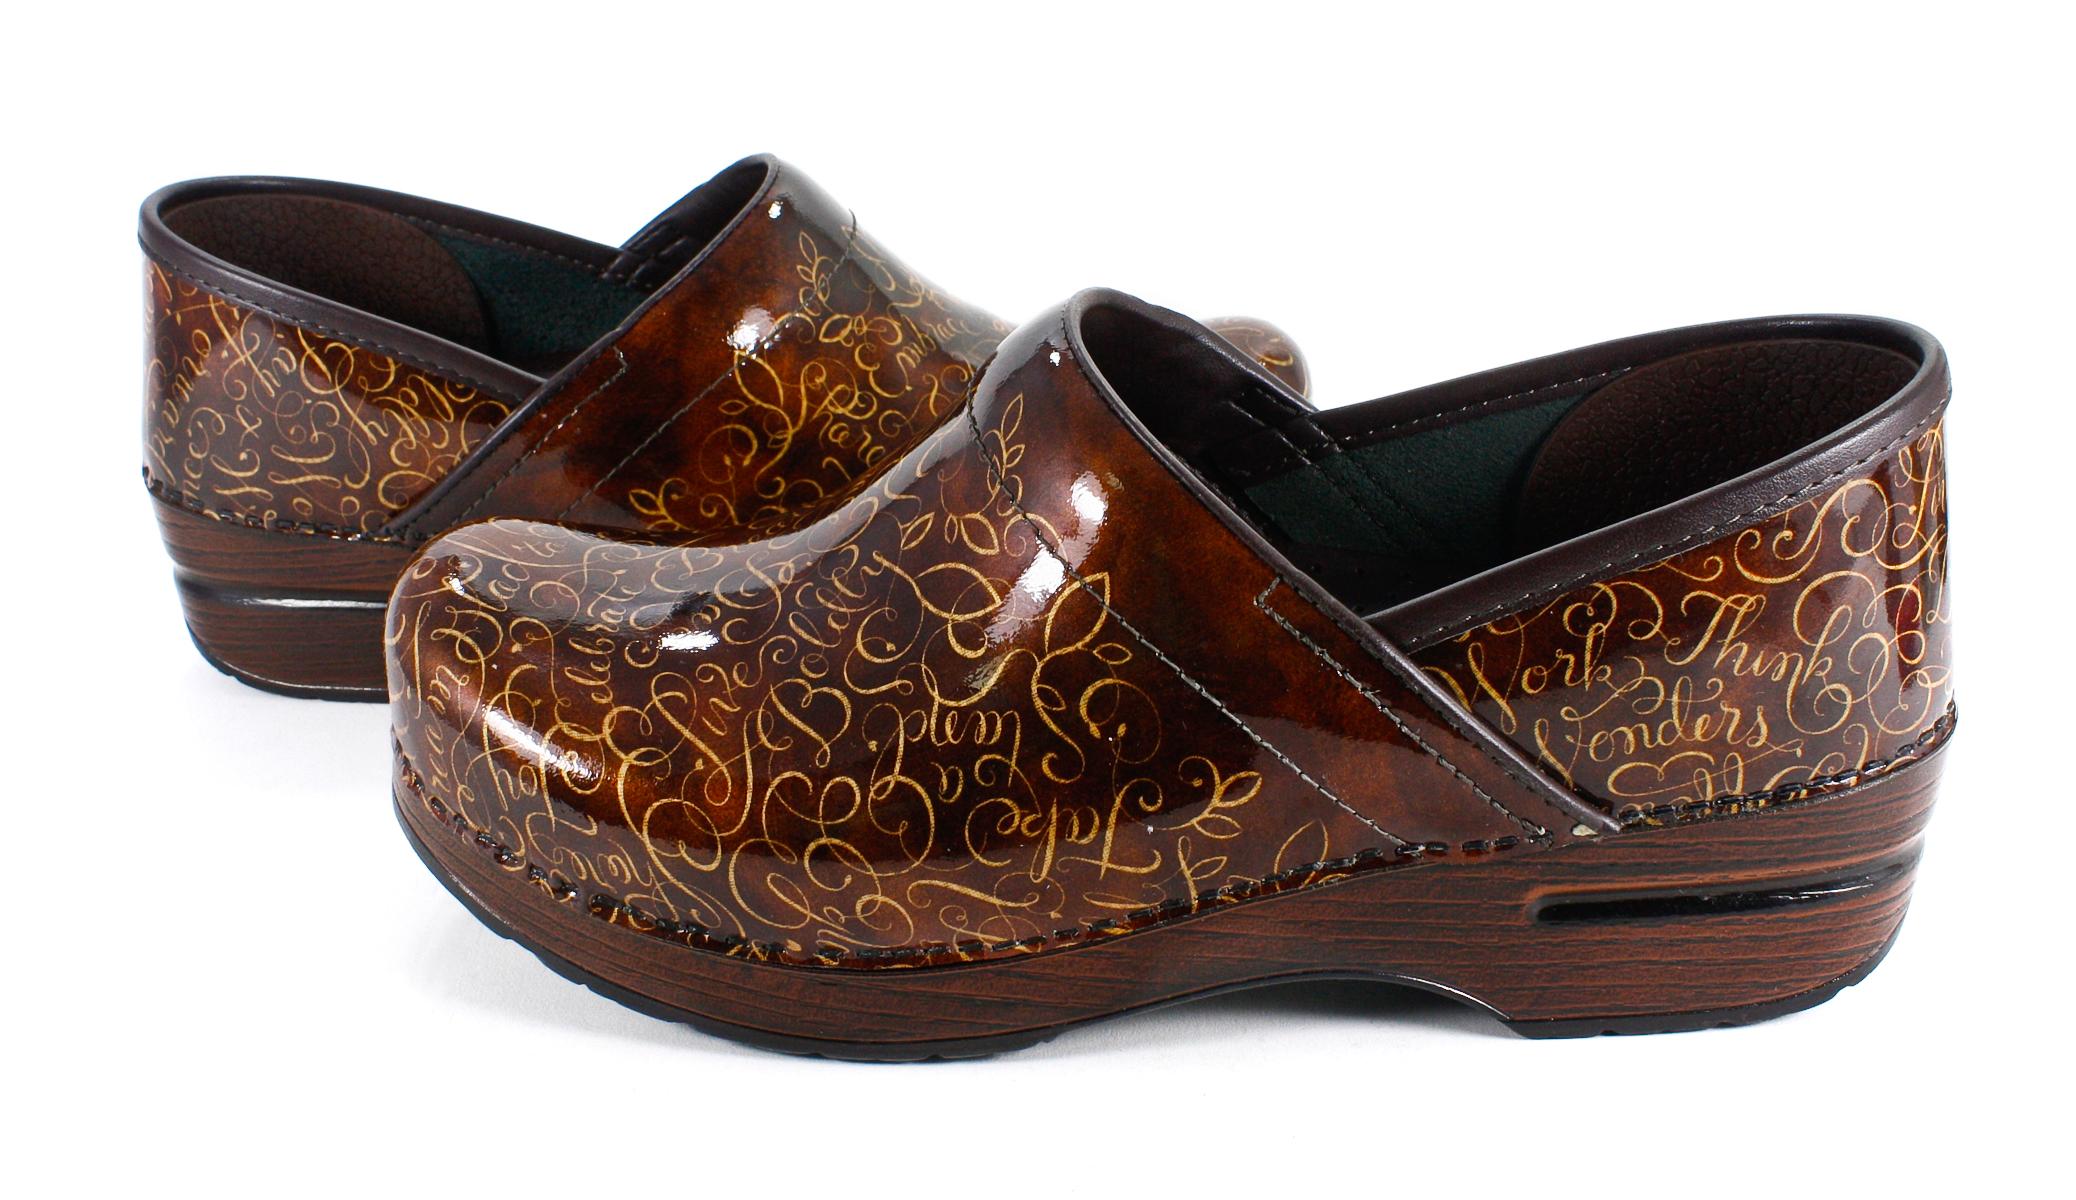 Dansko Professional Shoes